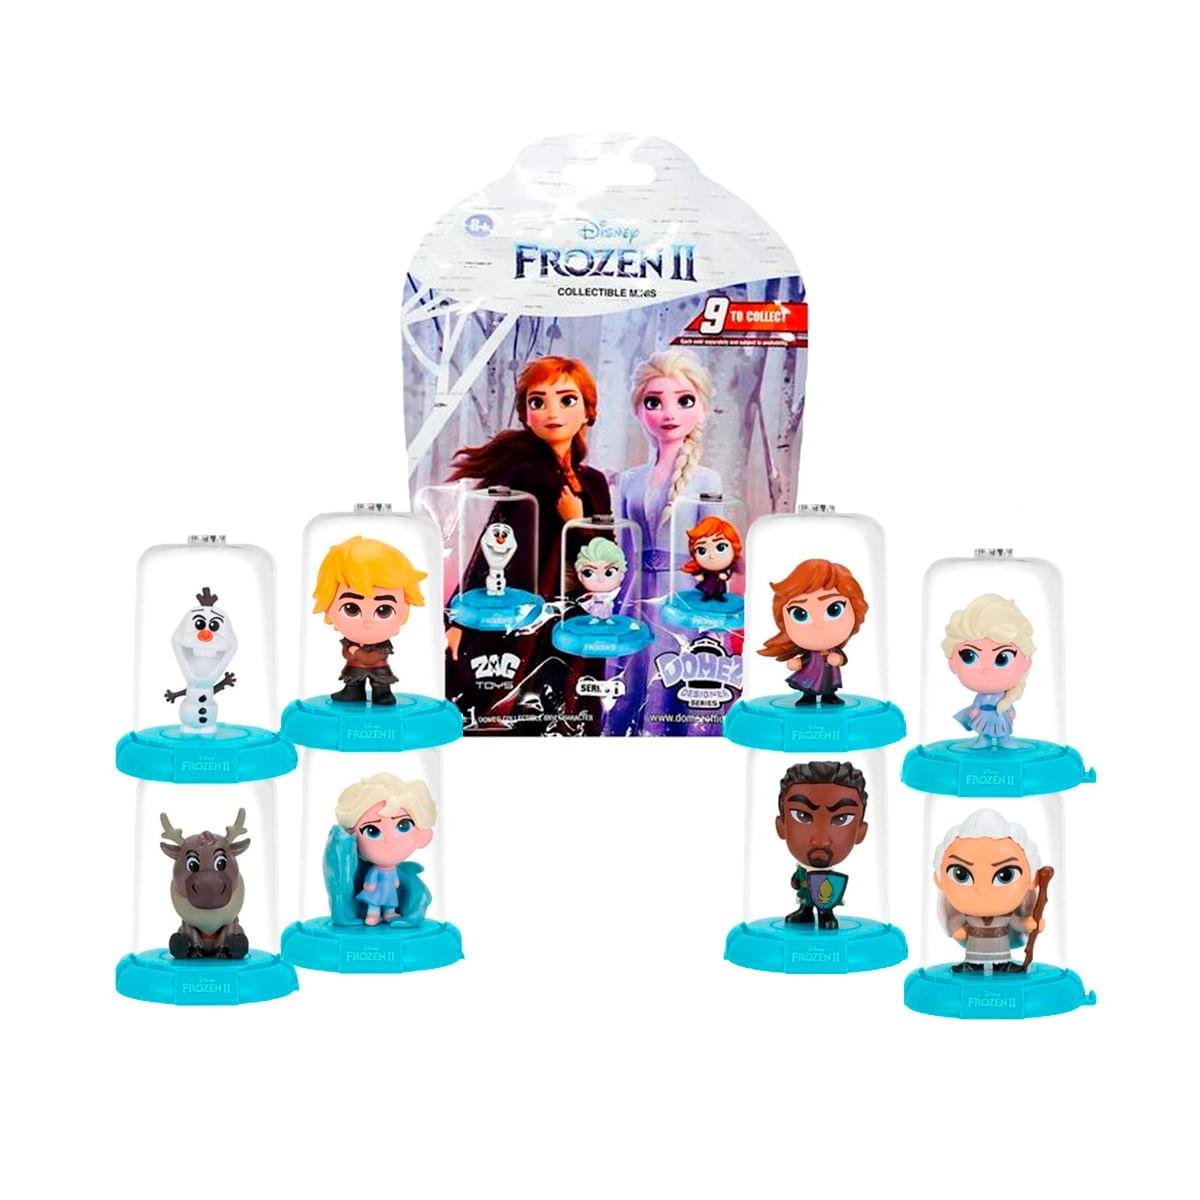 Domez-Miniaturas-Frozen-2